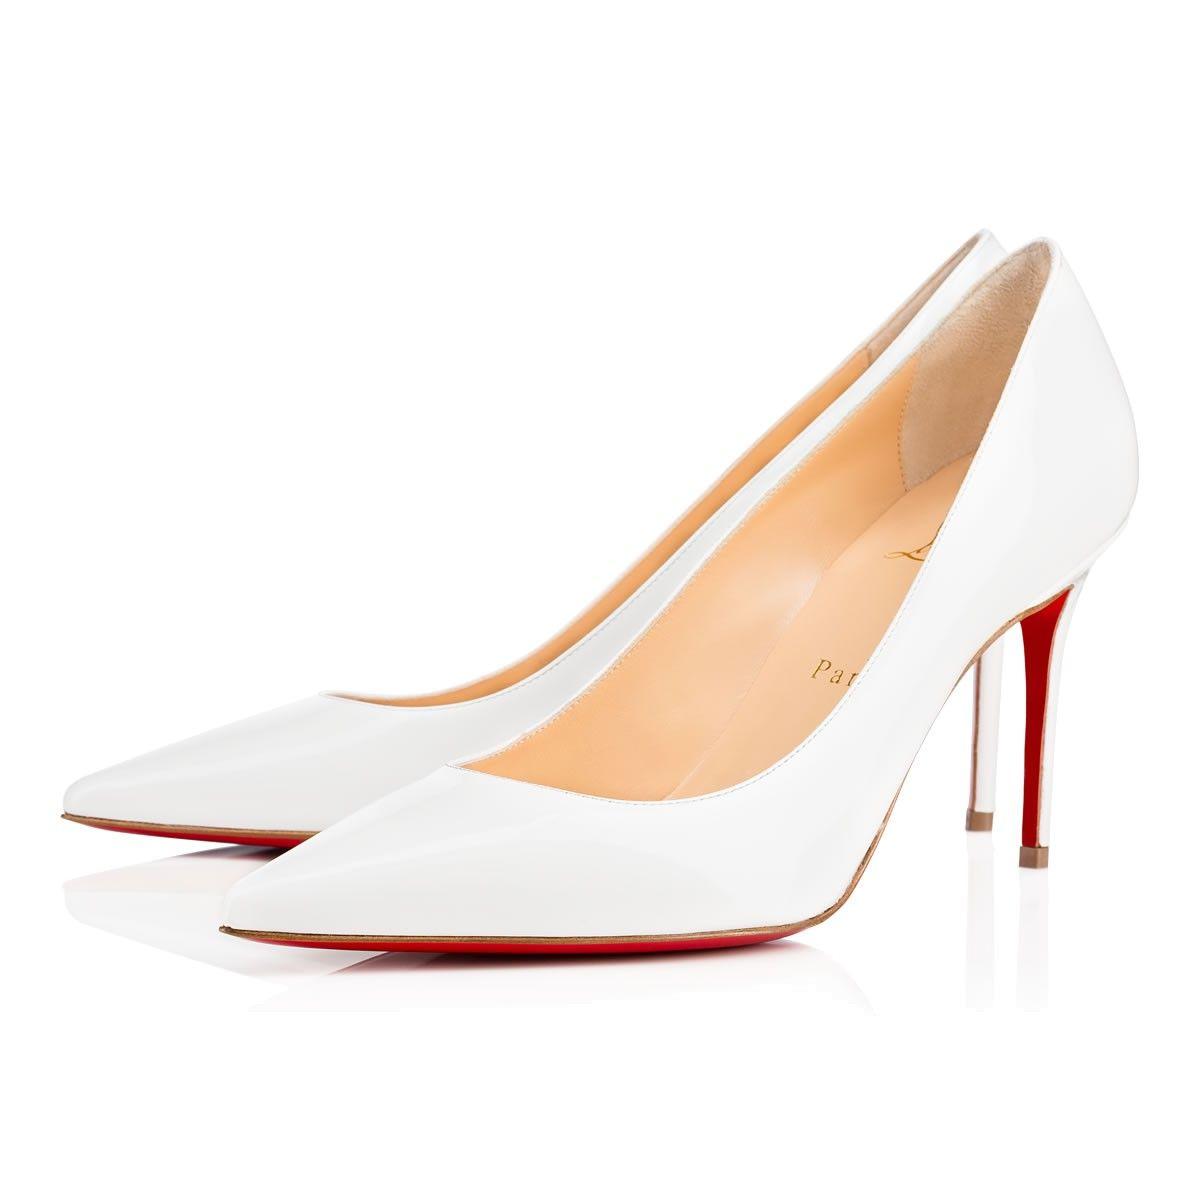 on sale 3c2a4 426de CHRISTIAN LOUBOUTIN Decollete 554 85 White Patent Leather ...